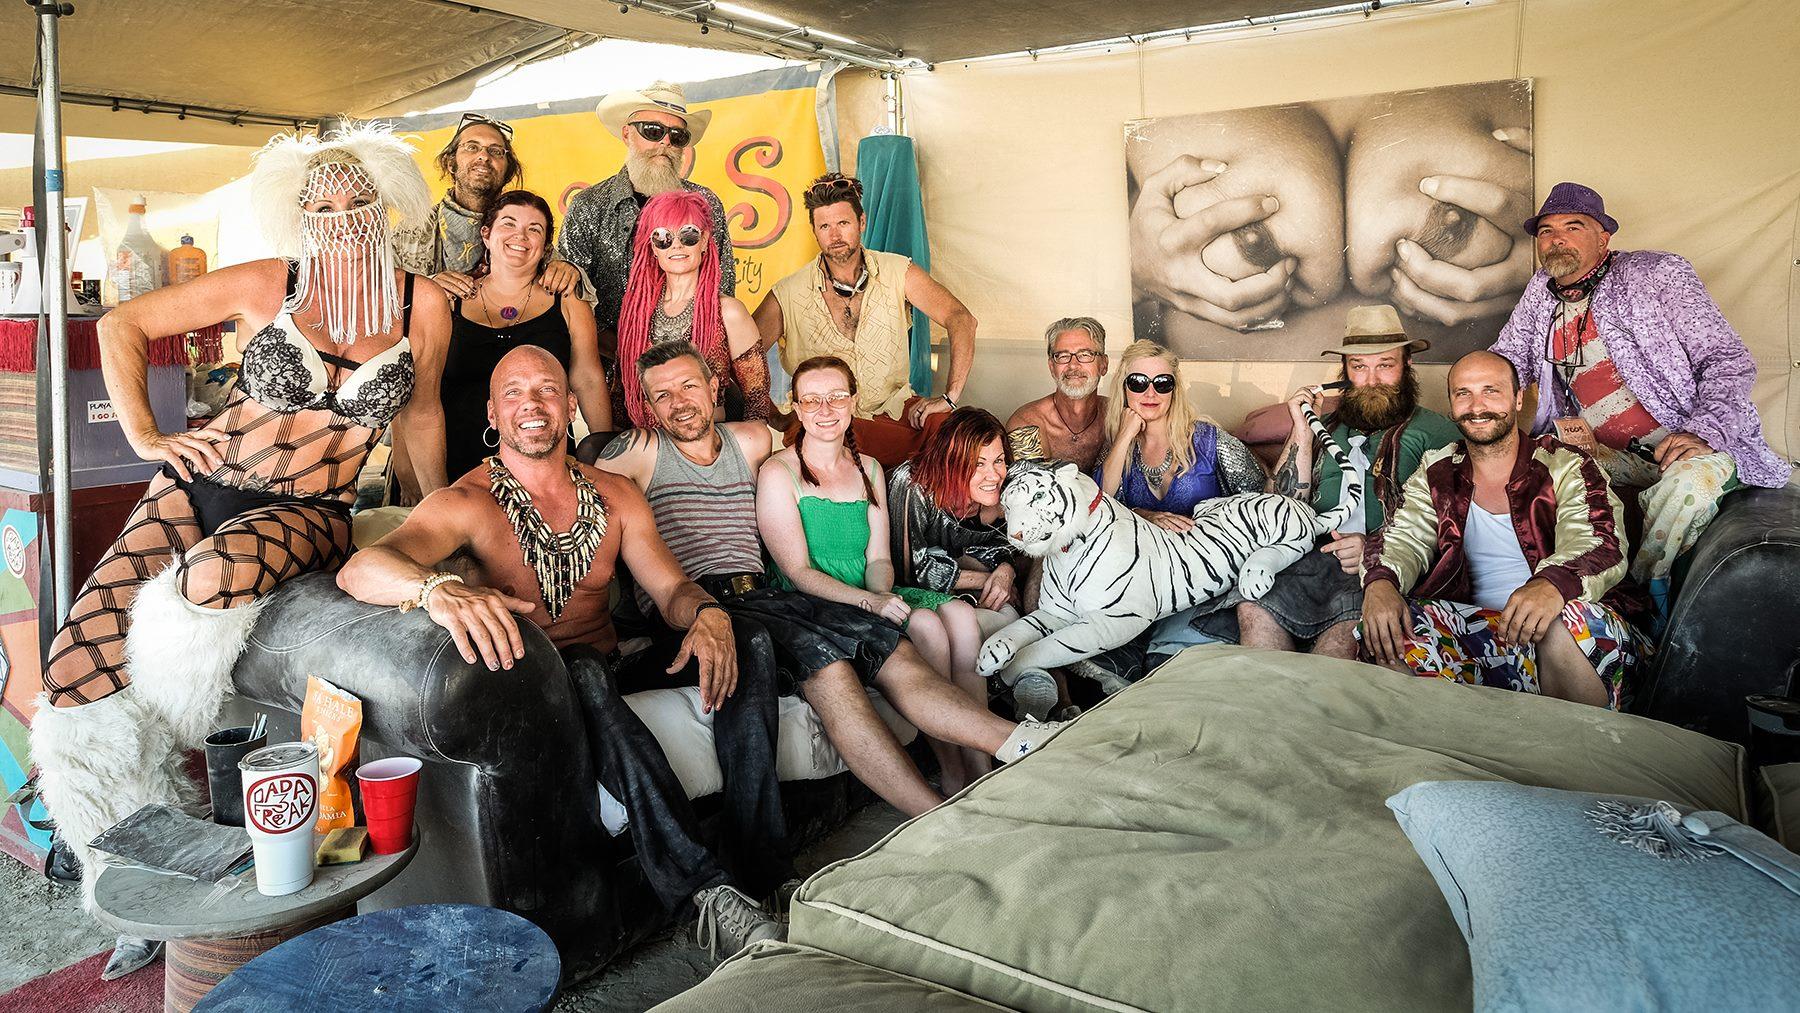 The 2017 crew at Dada 3